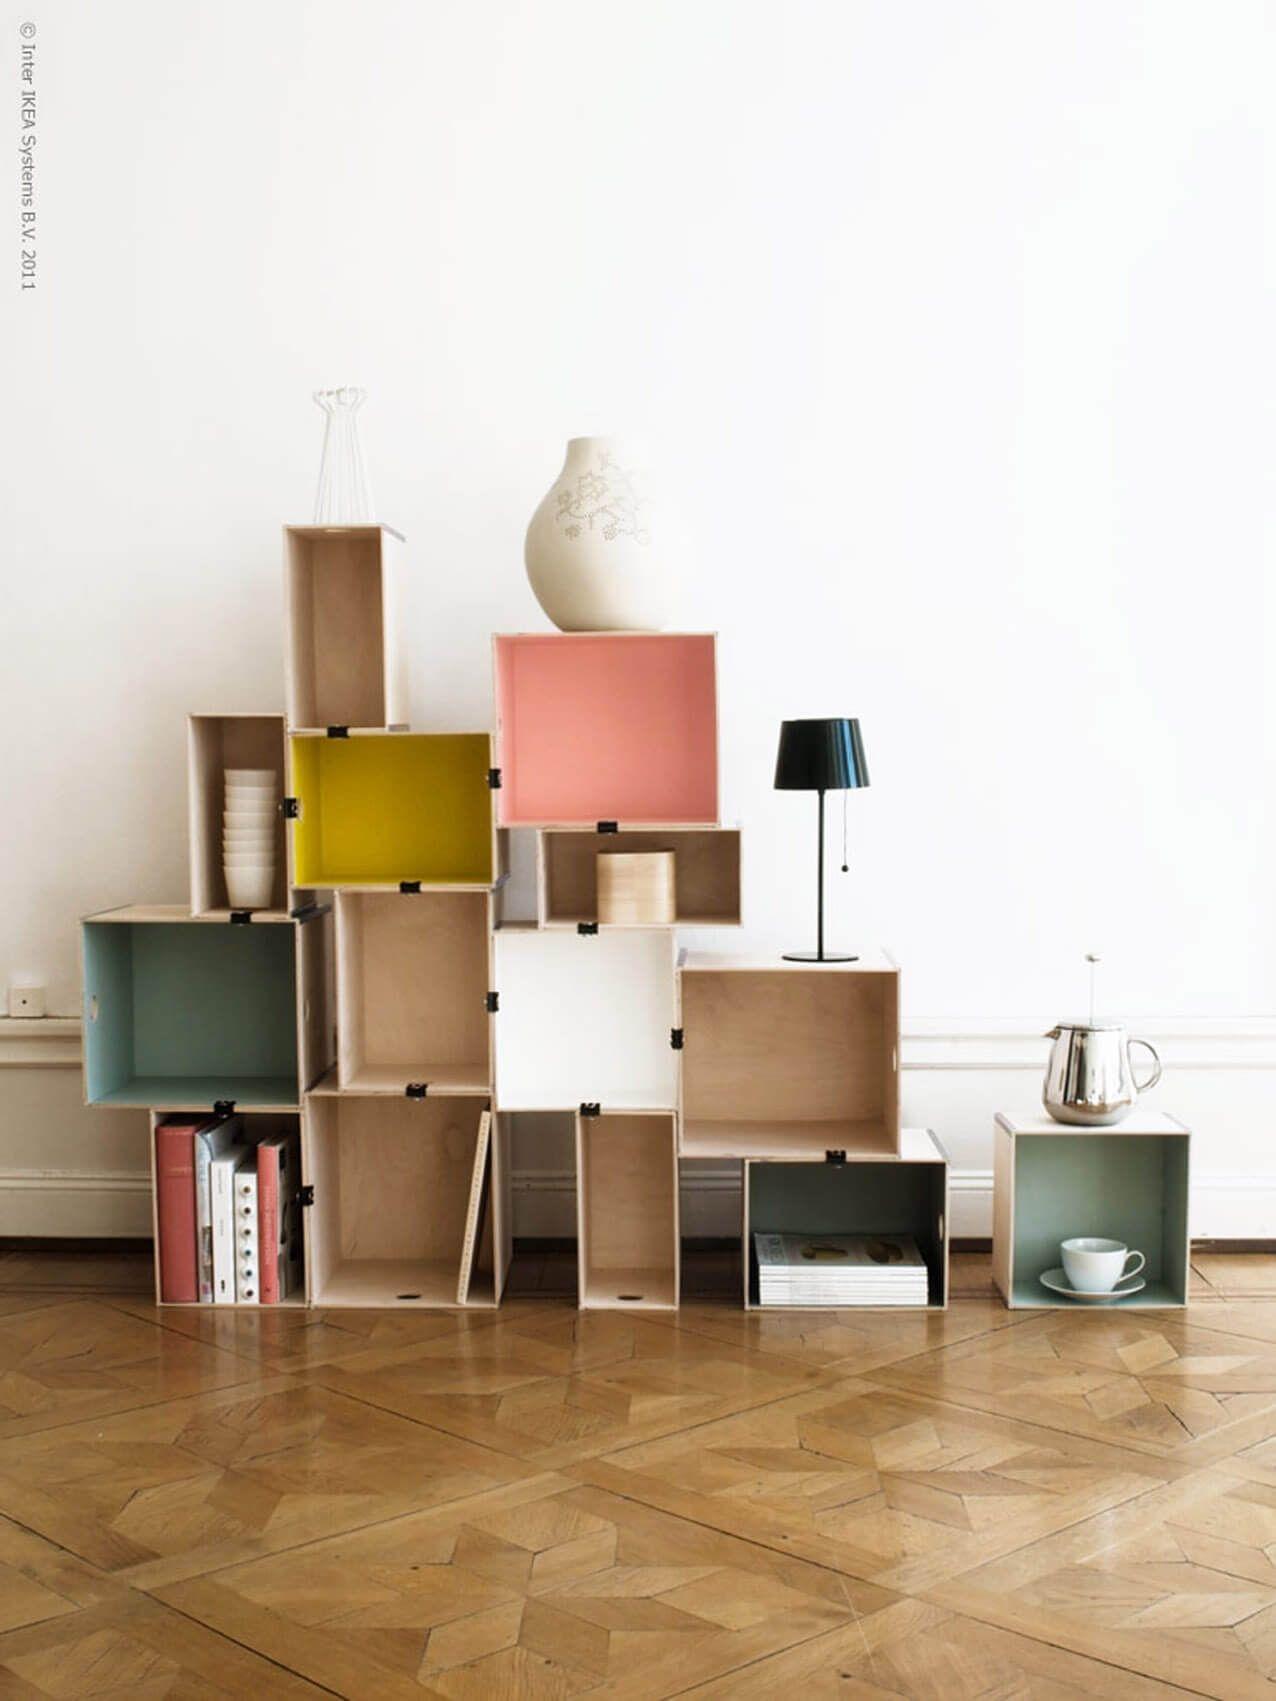 Cubist Plywood Box Bookshelf With Binder Clips